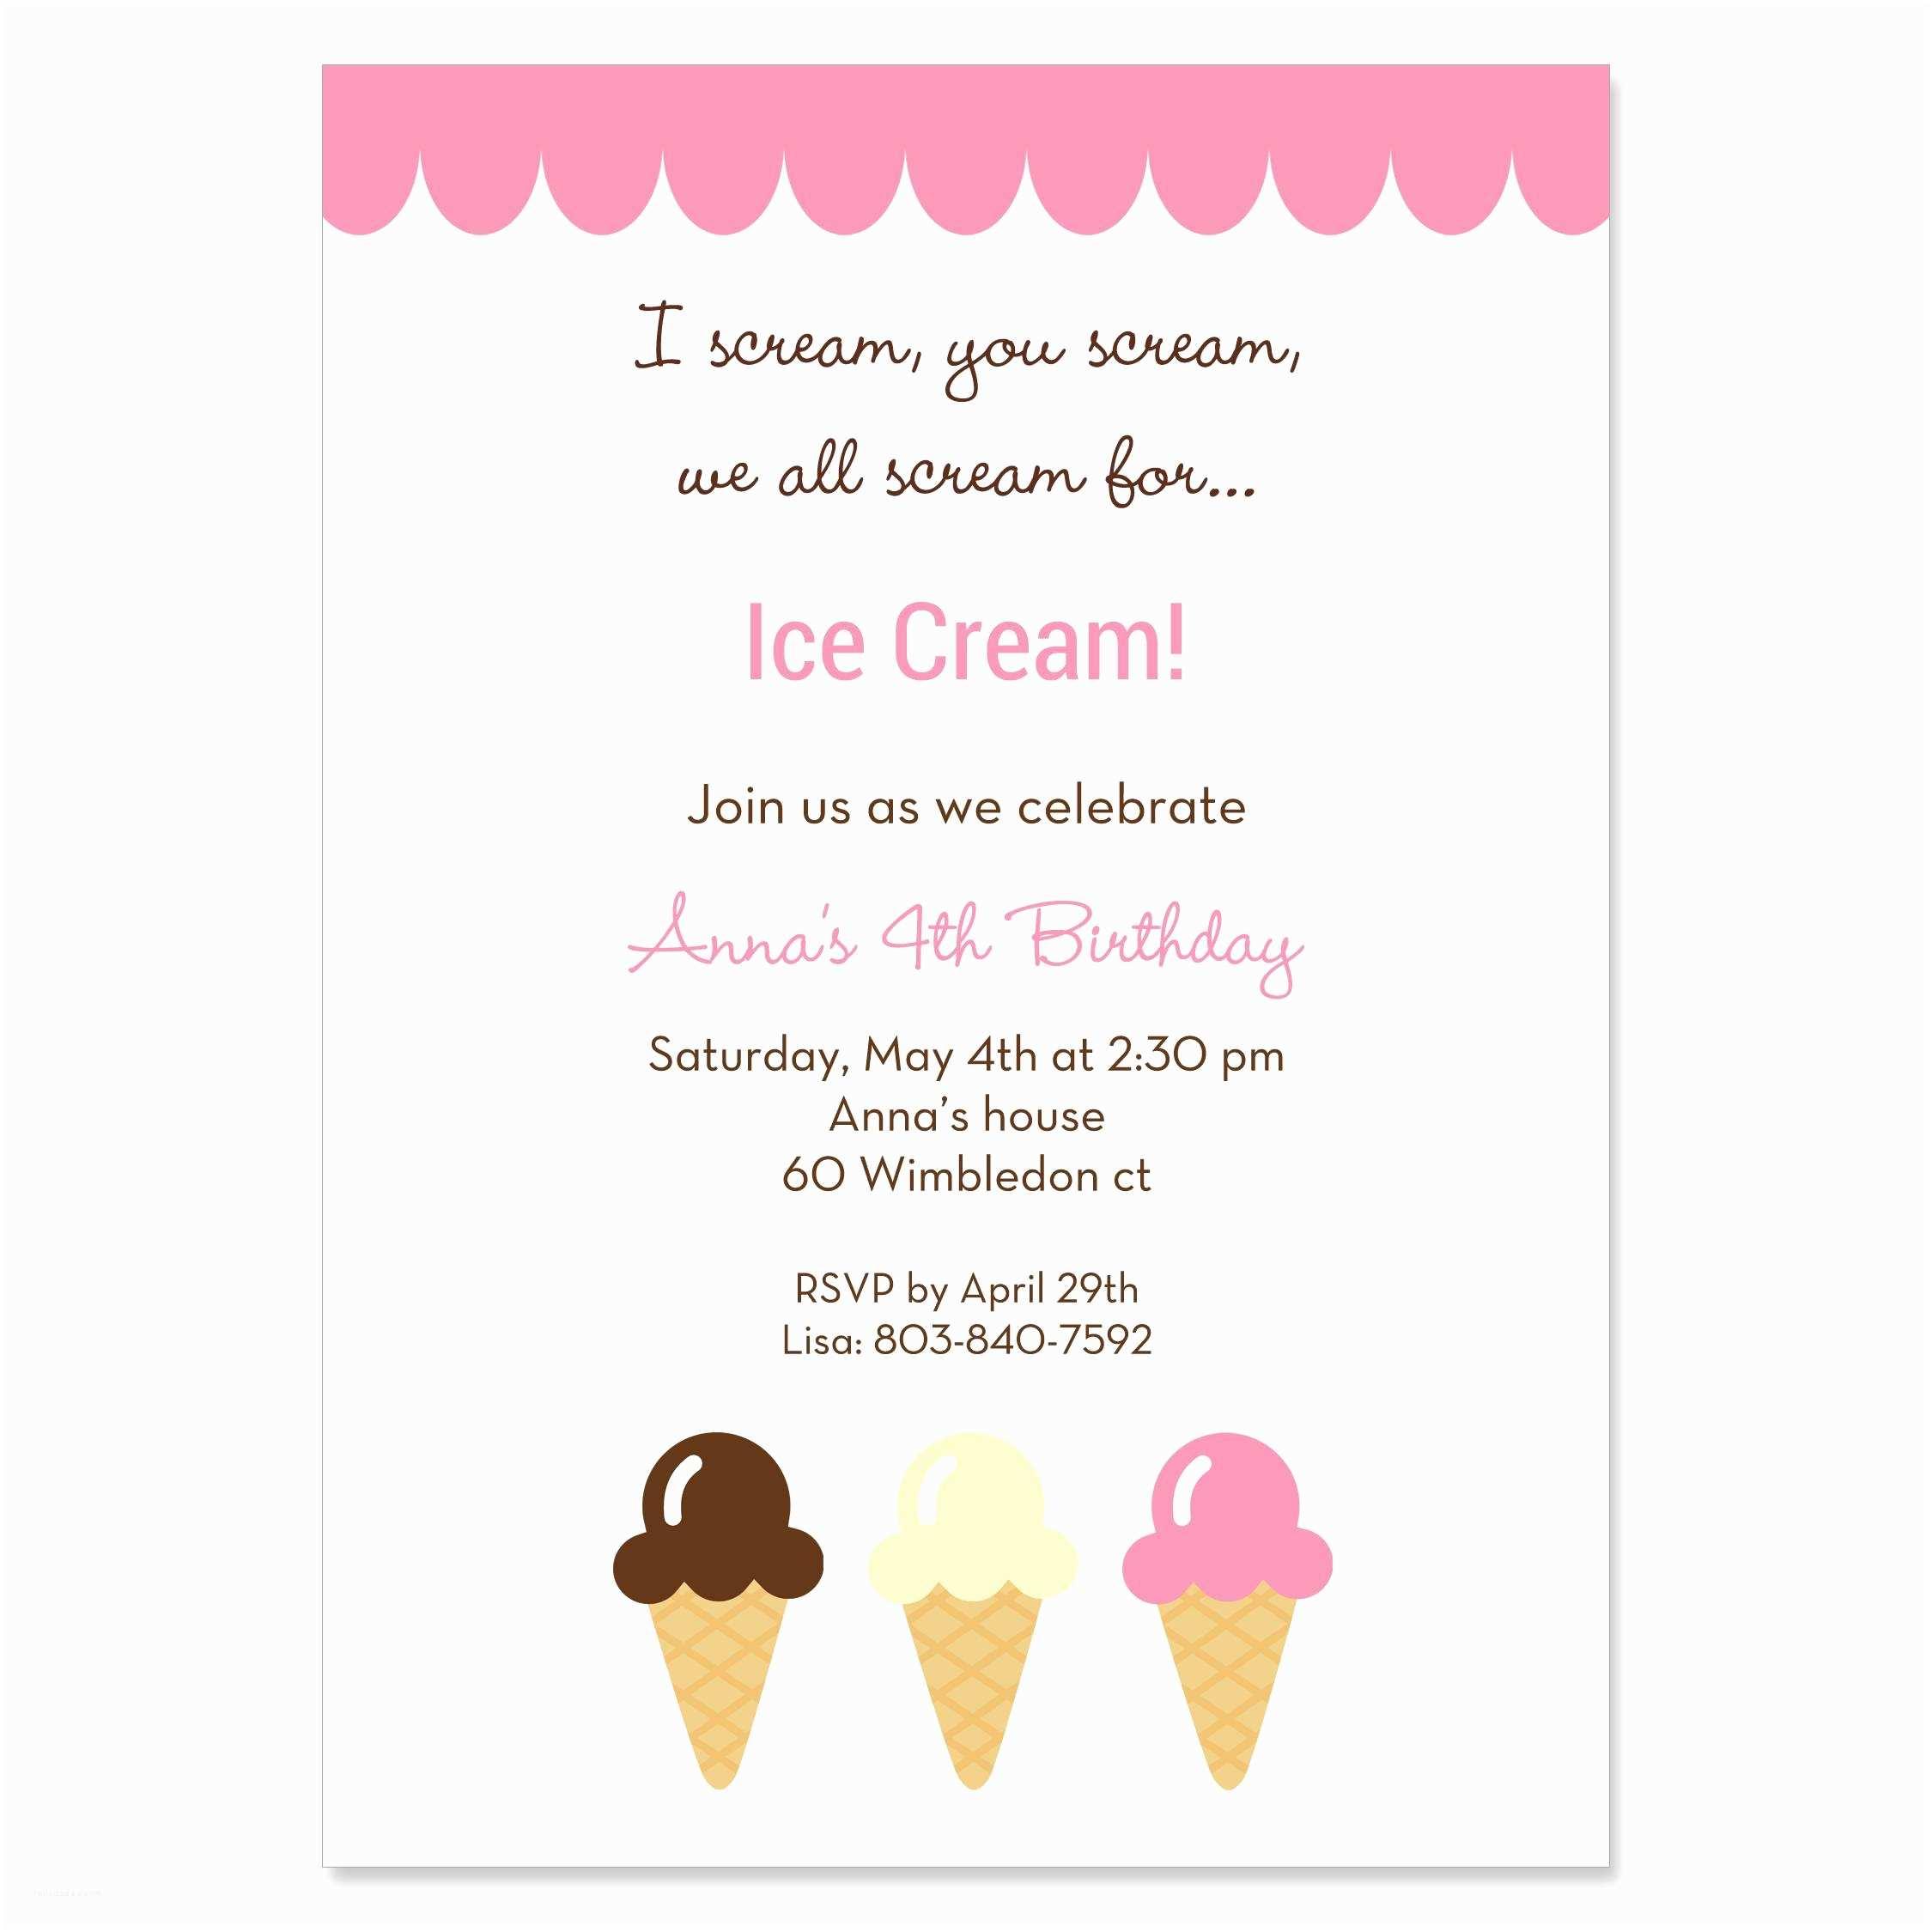 Ice Cream Birthday Party Invitations Ice Cream Party Invitations